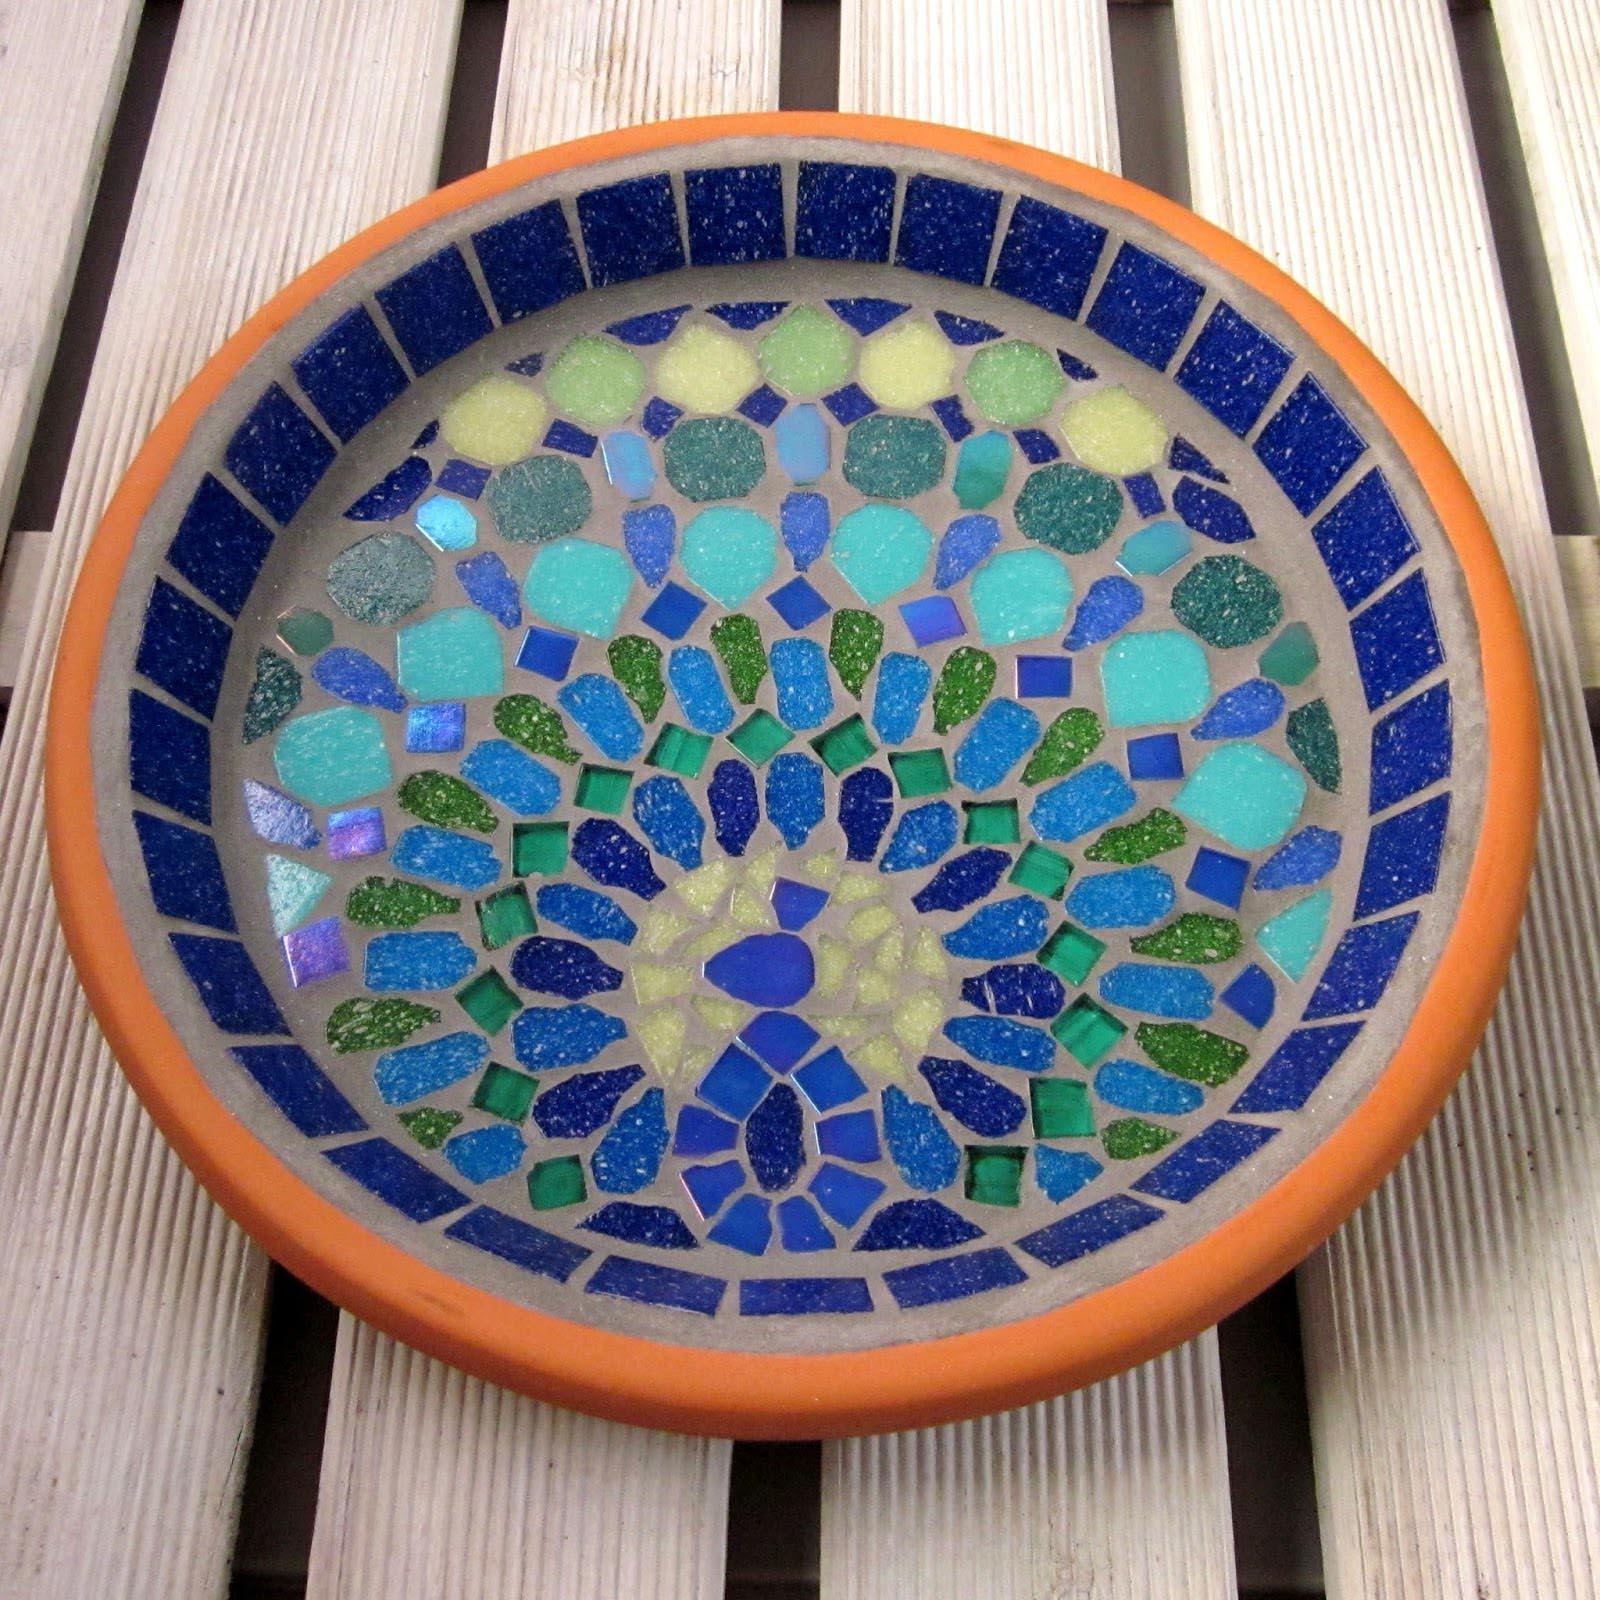 Bird Bath Mosaic Patterns